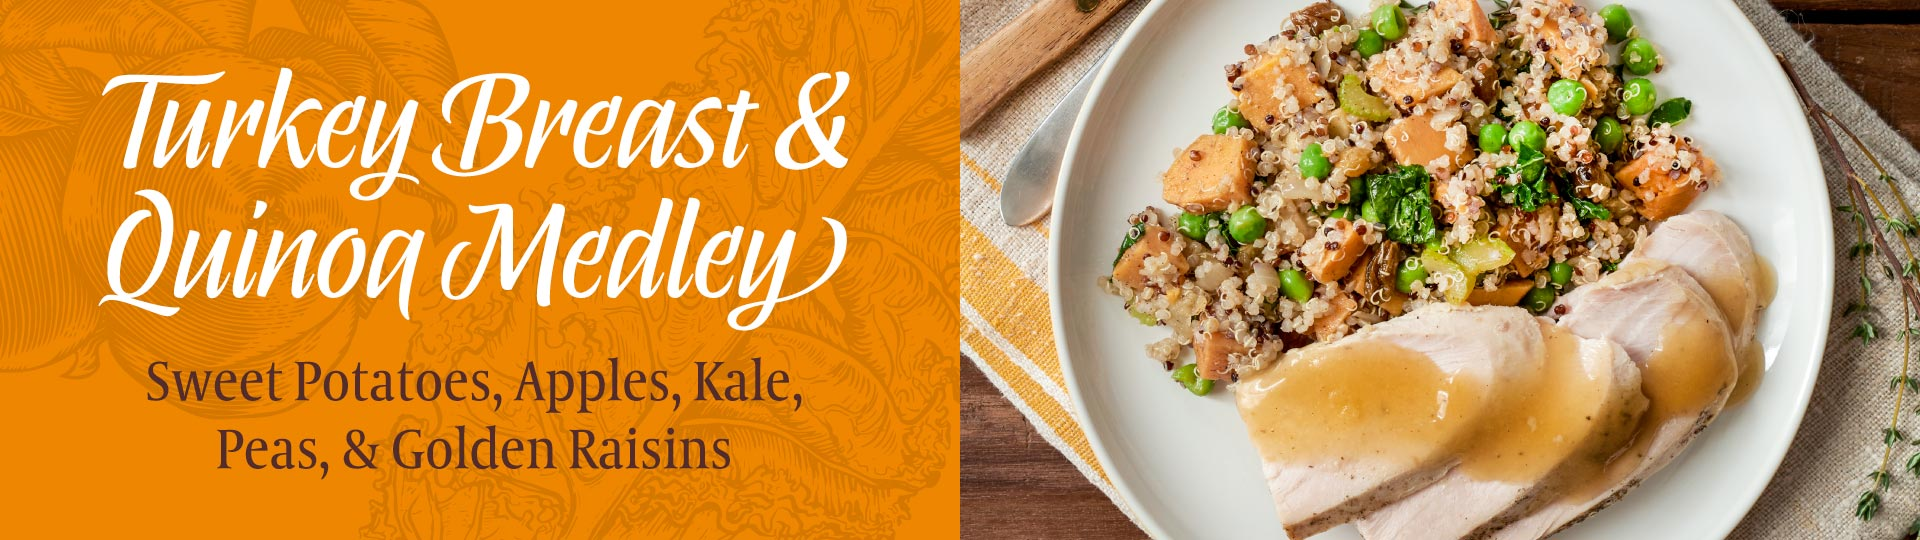 Turkey Breast & Quinoa Medley